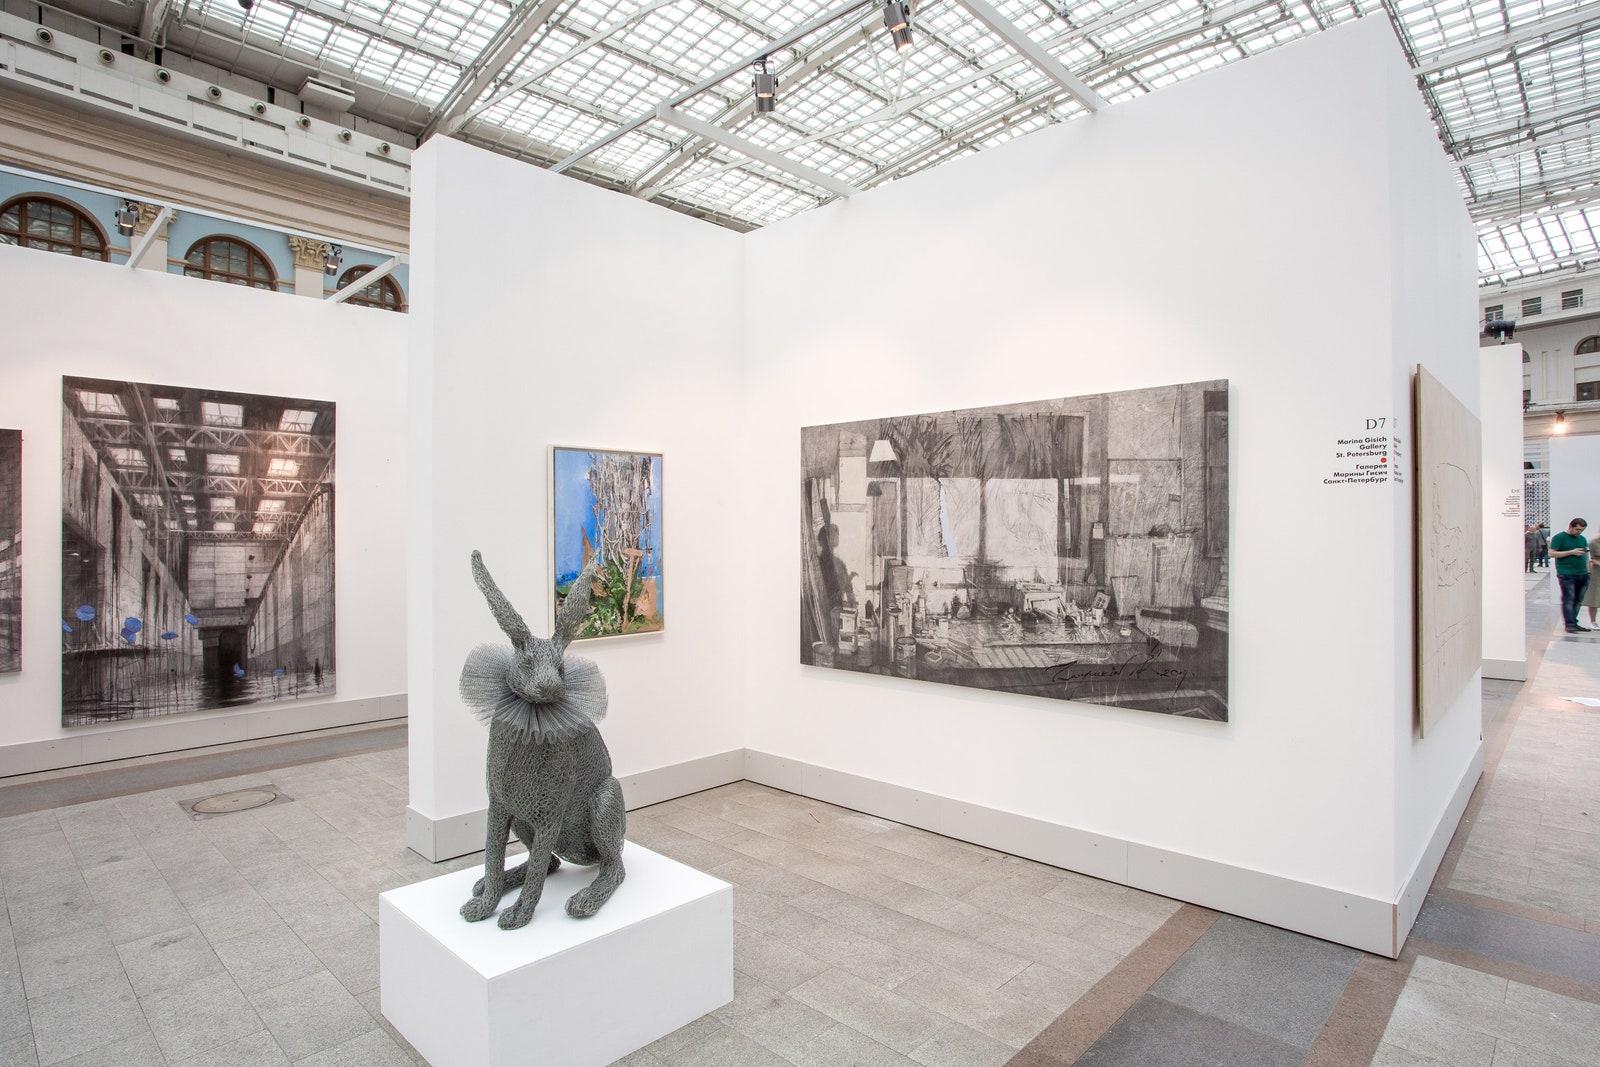 20  Marina Gisich Gallery